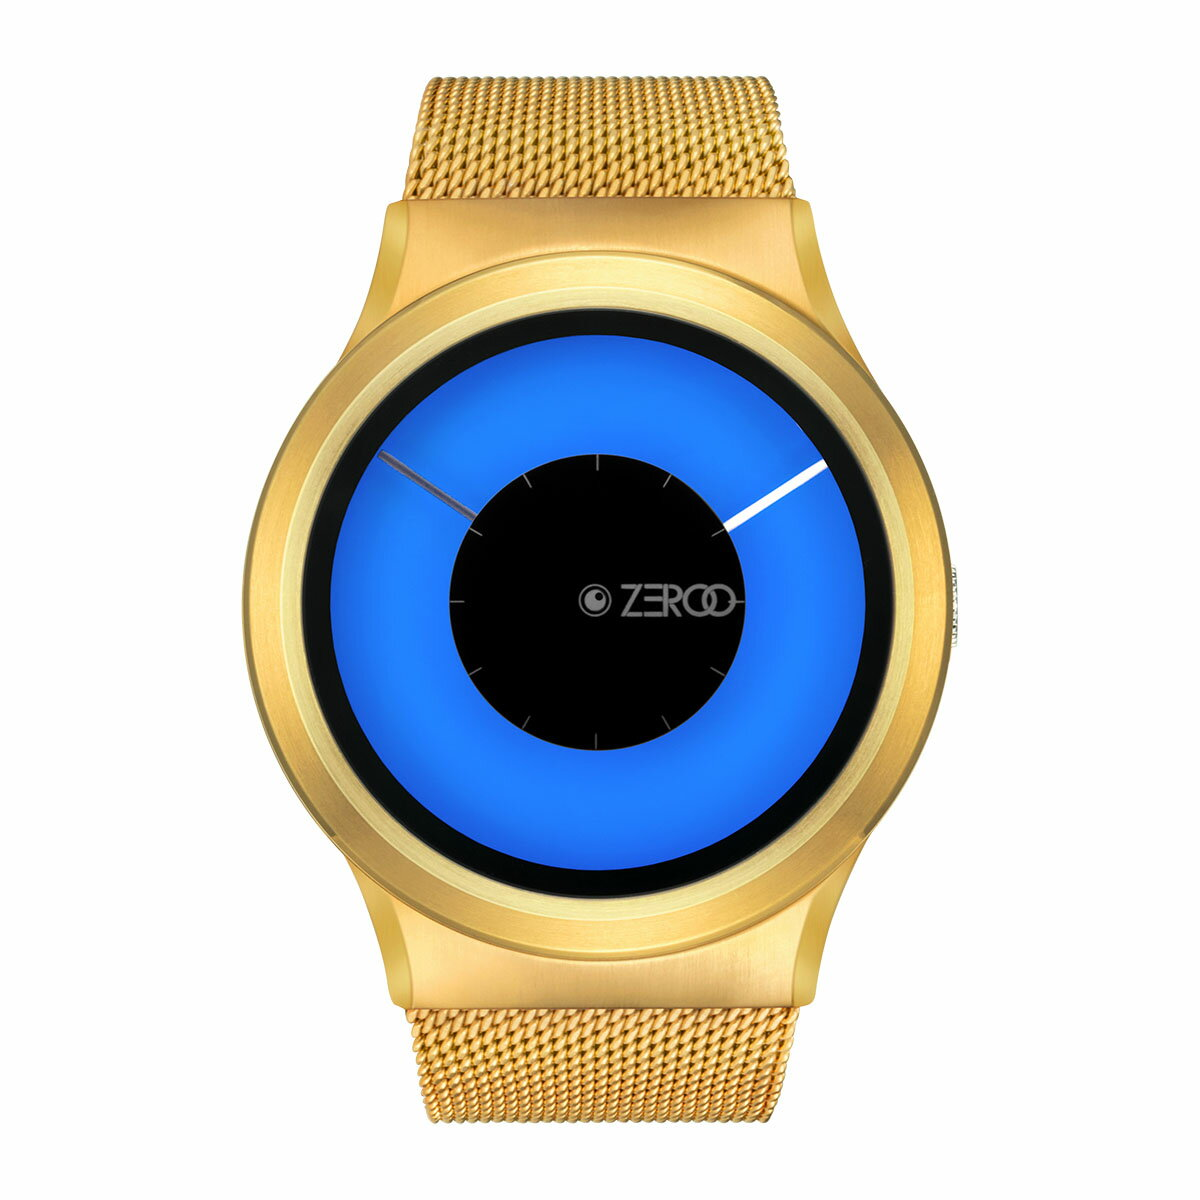 ZEROO MAGIA AURORA ゼロ 電池式クォーツ 腕時計 [W11026B04SM04] ブルー デザインウォッチ ペア用 メンズ レディース ユニセックス おしゃれ時計 デザイナーズ